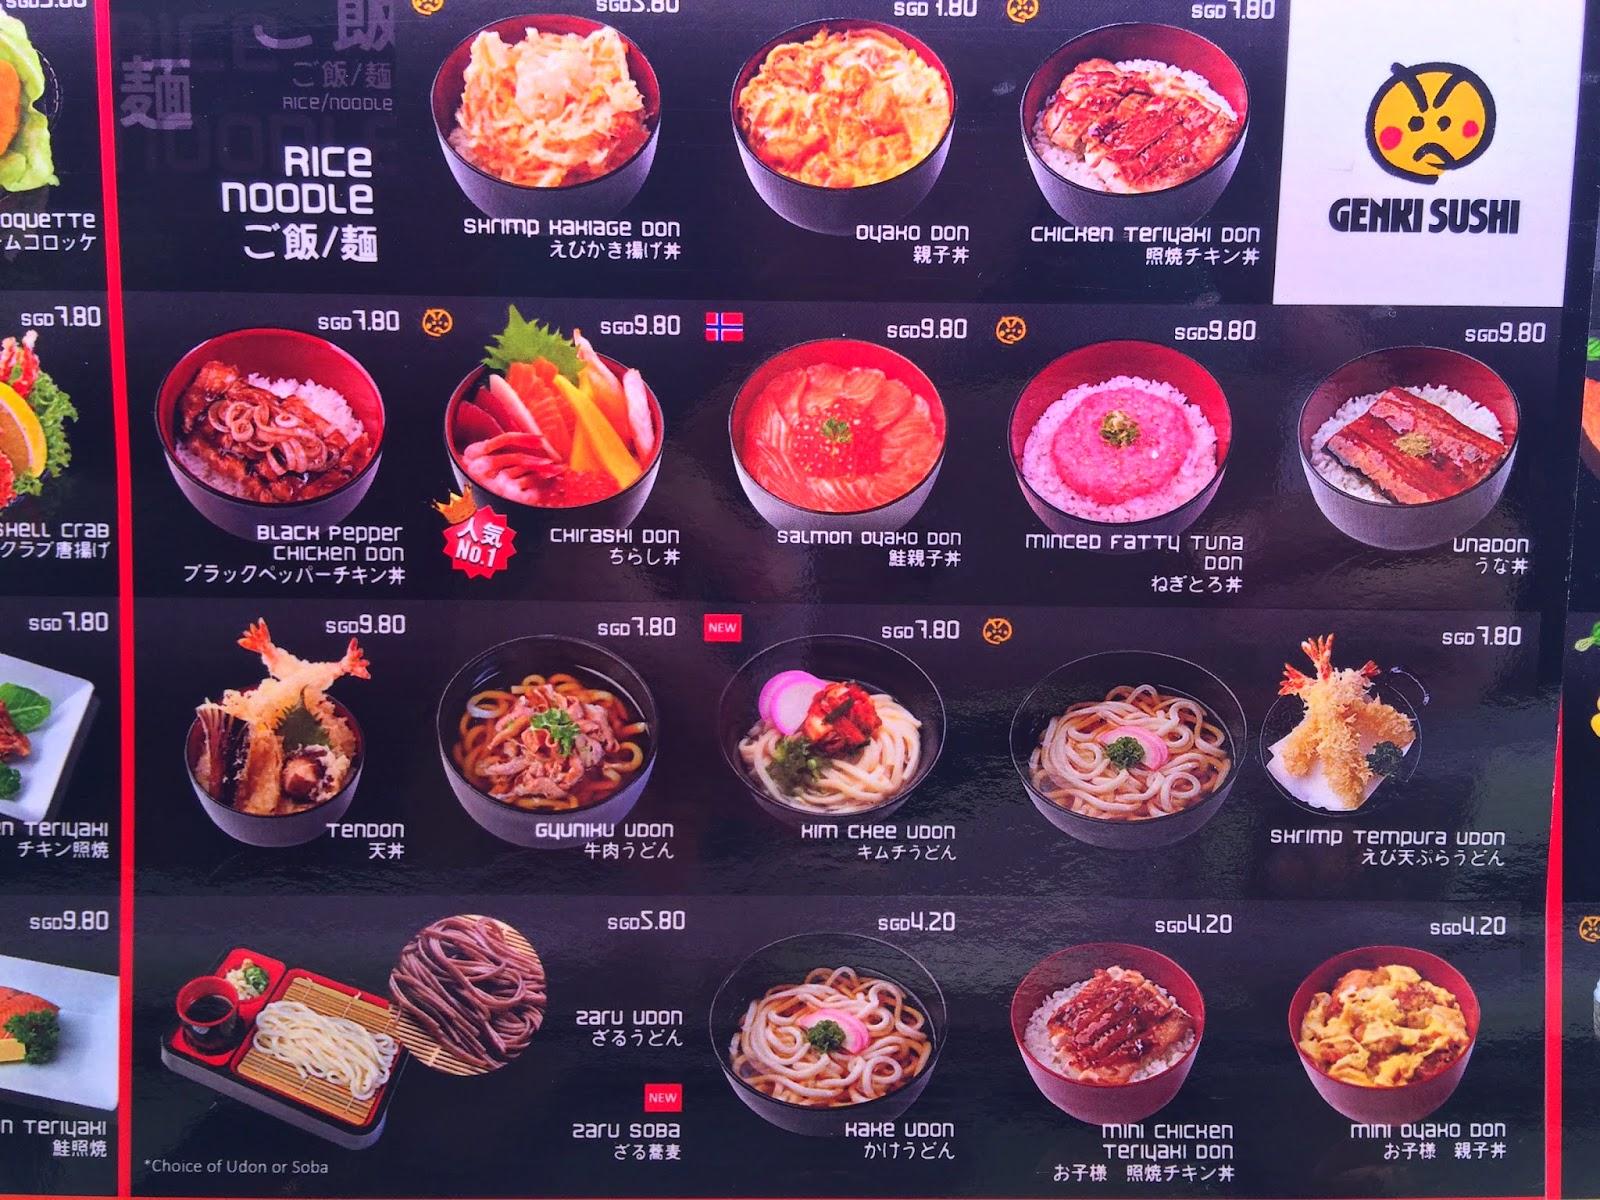 ipad 4 price in singapore